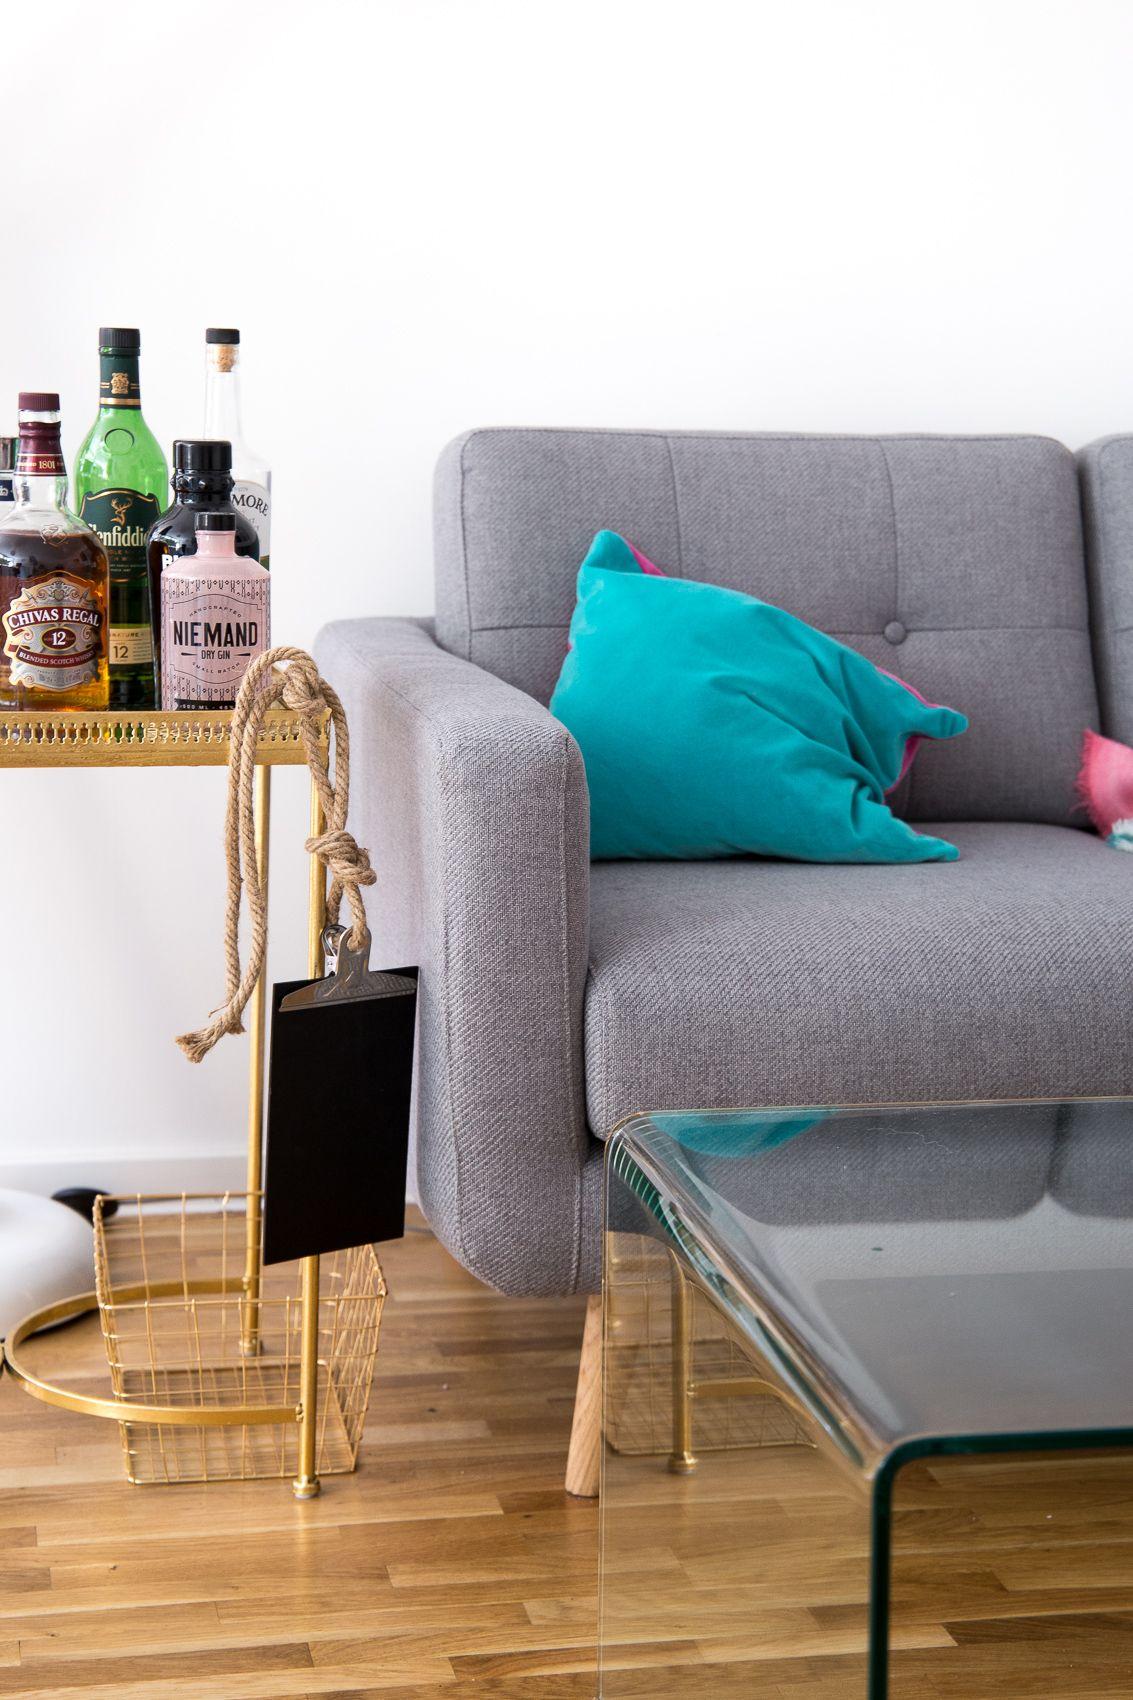 Home sweet home - Neues Sofa & Wohnzimmer Inspiration ...